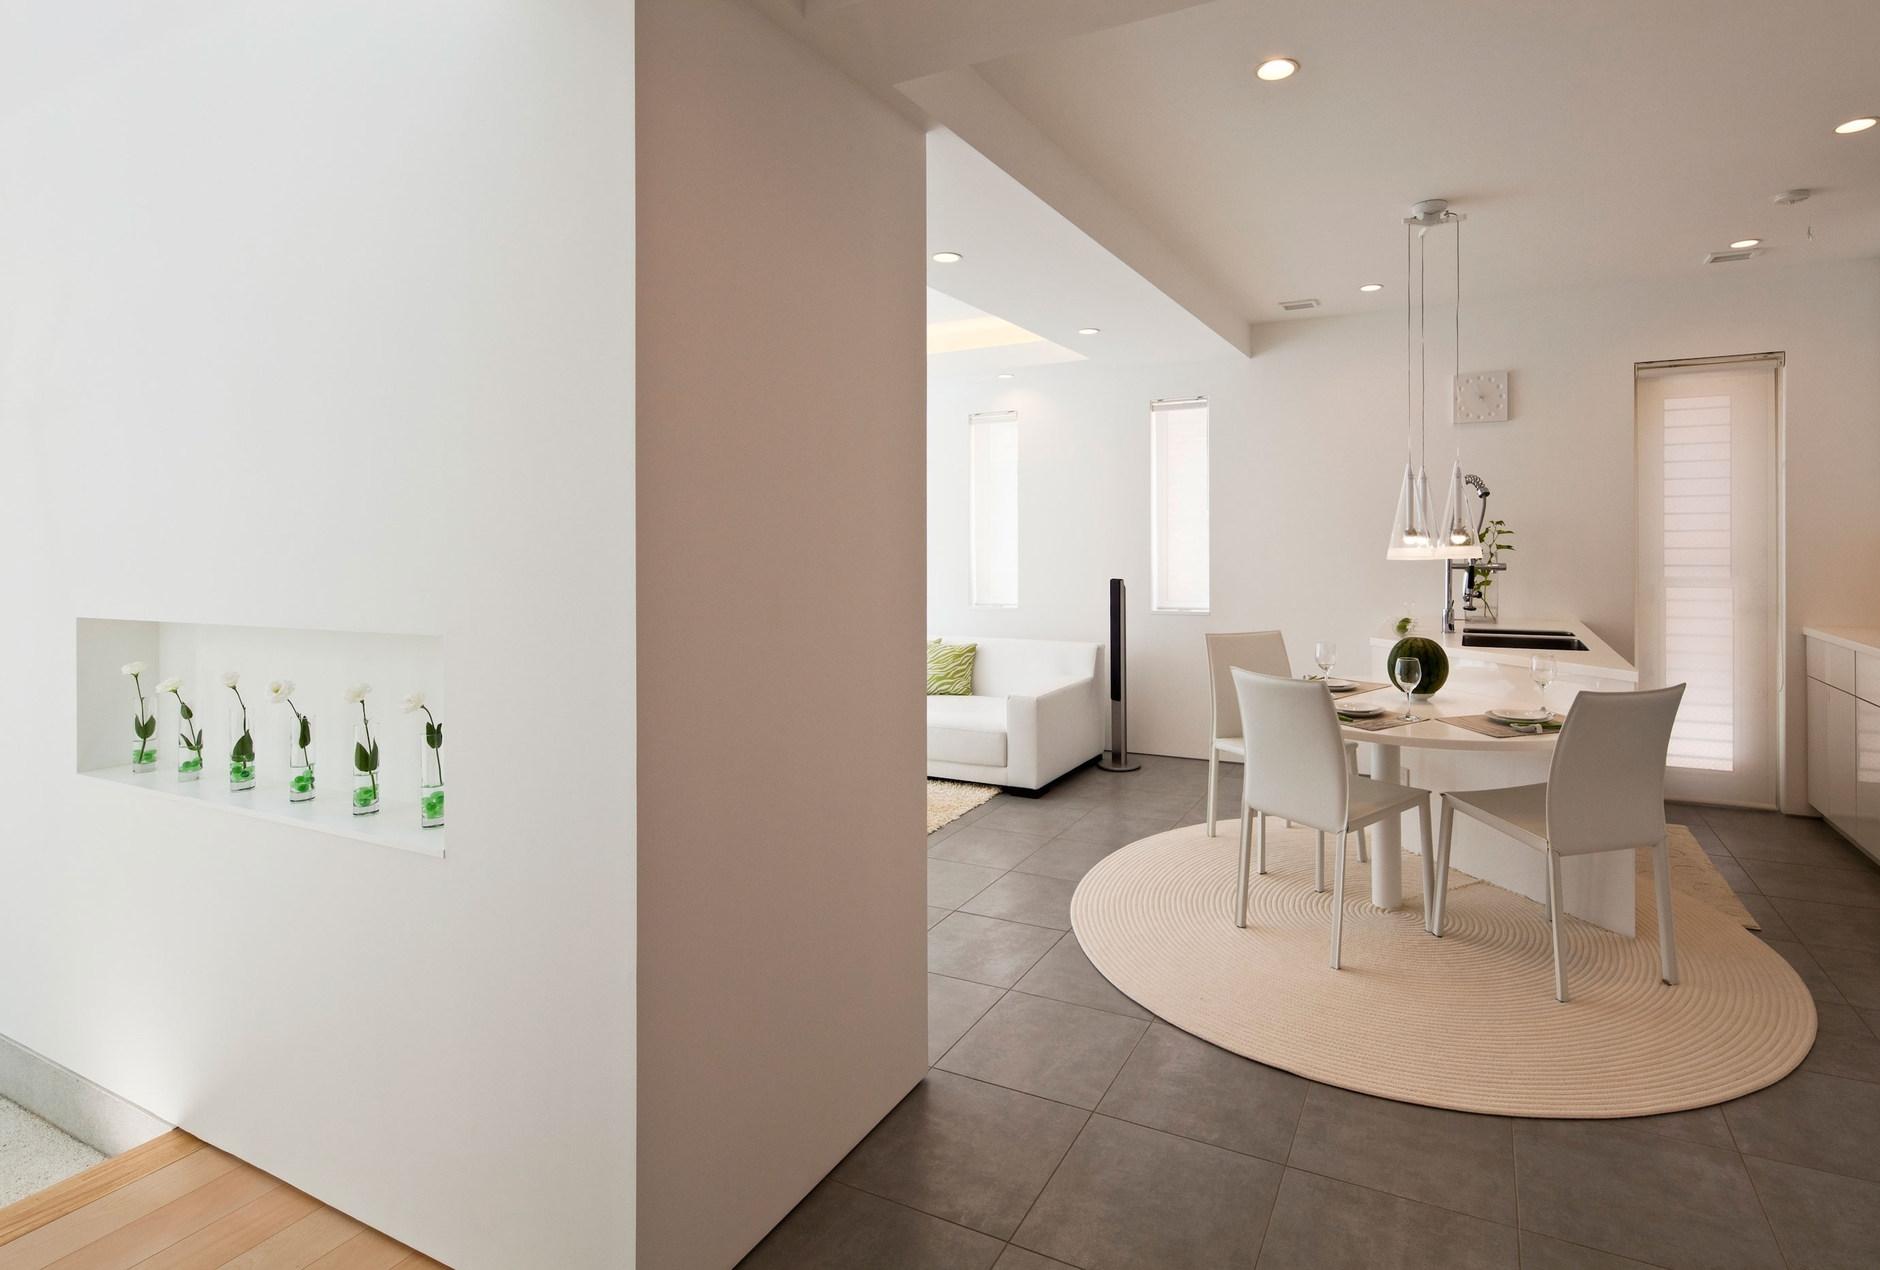 Modern Zen House by RCK Design | KARMATRENDZ